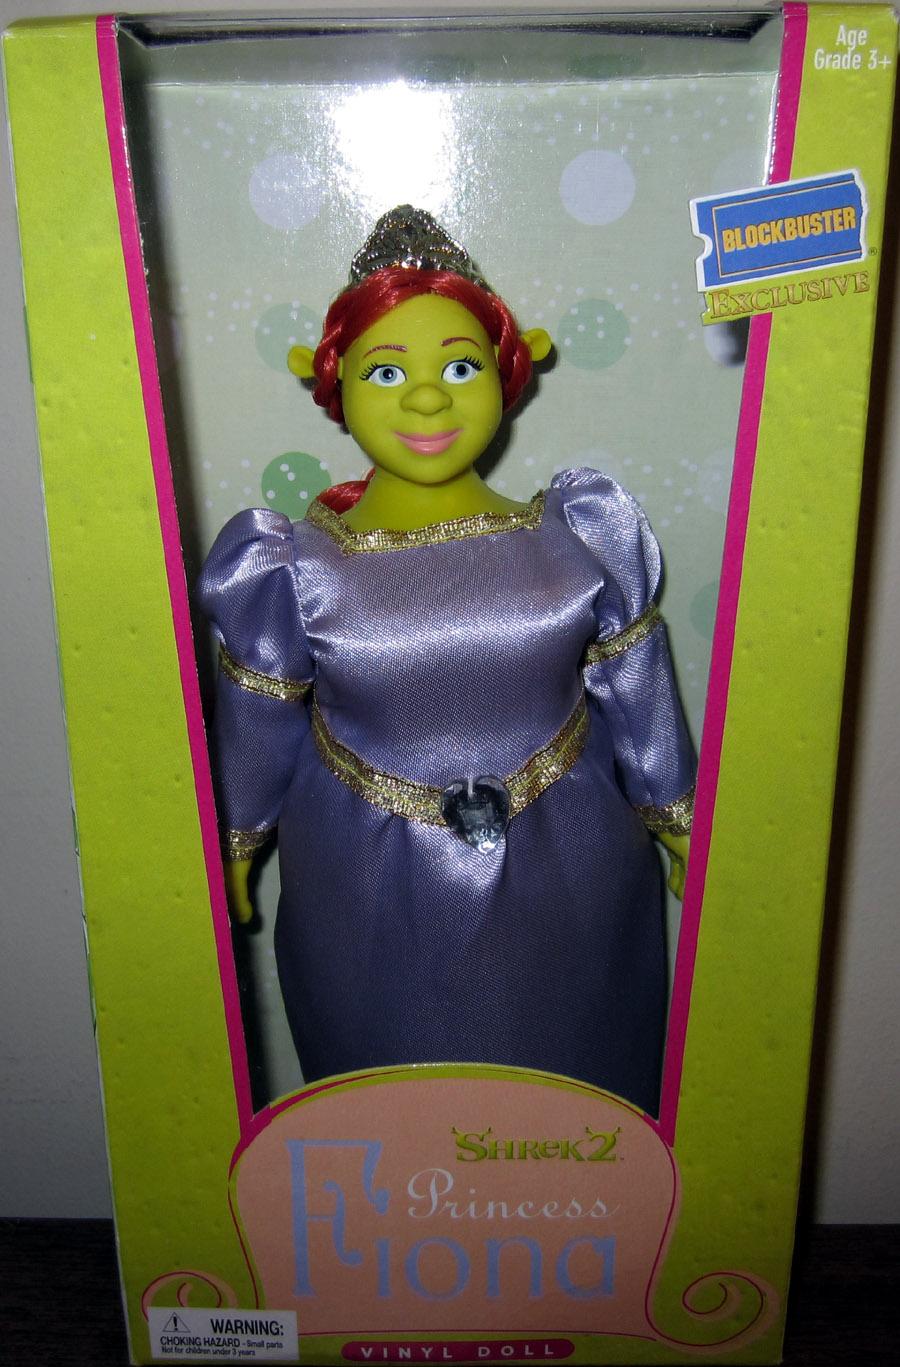 8 Inch Princess Fiona Vinyl Doll Shrek 2 Blockbuster Exclusive